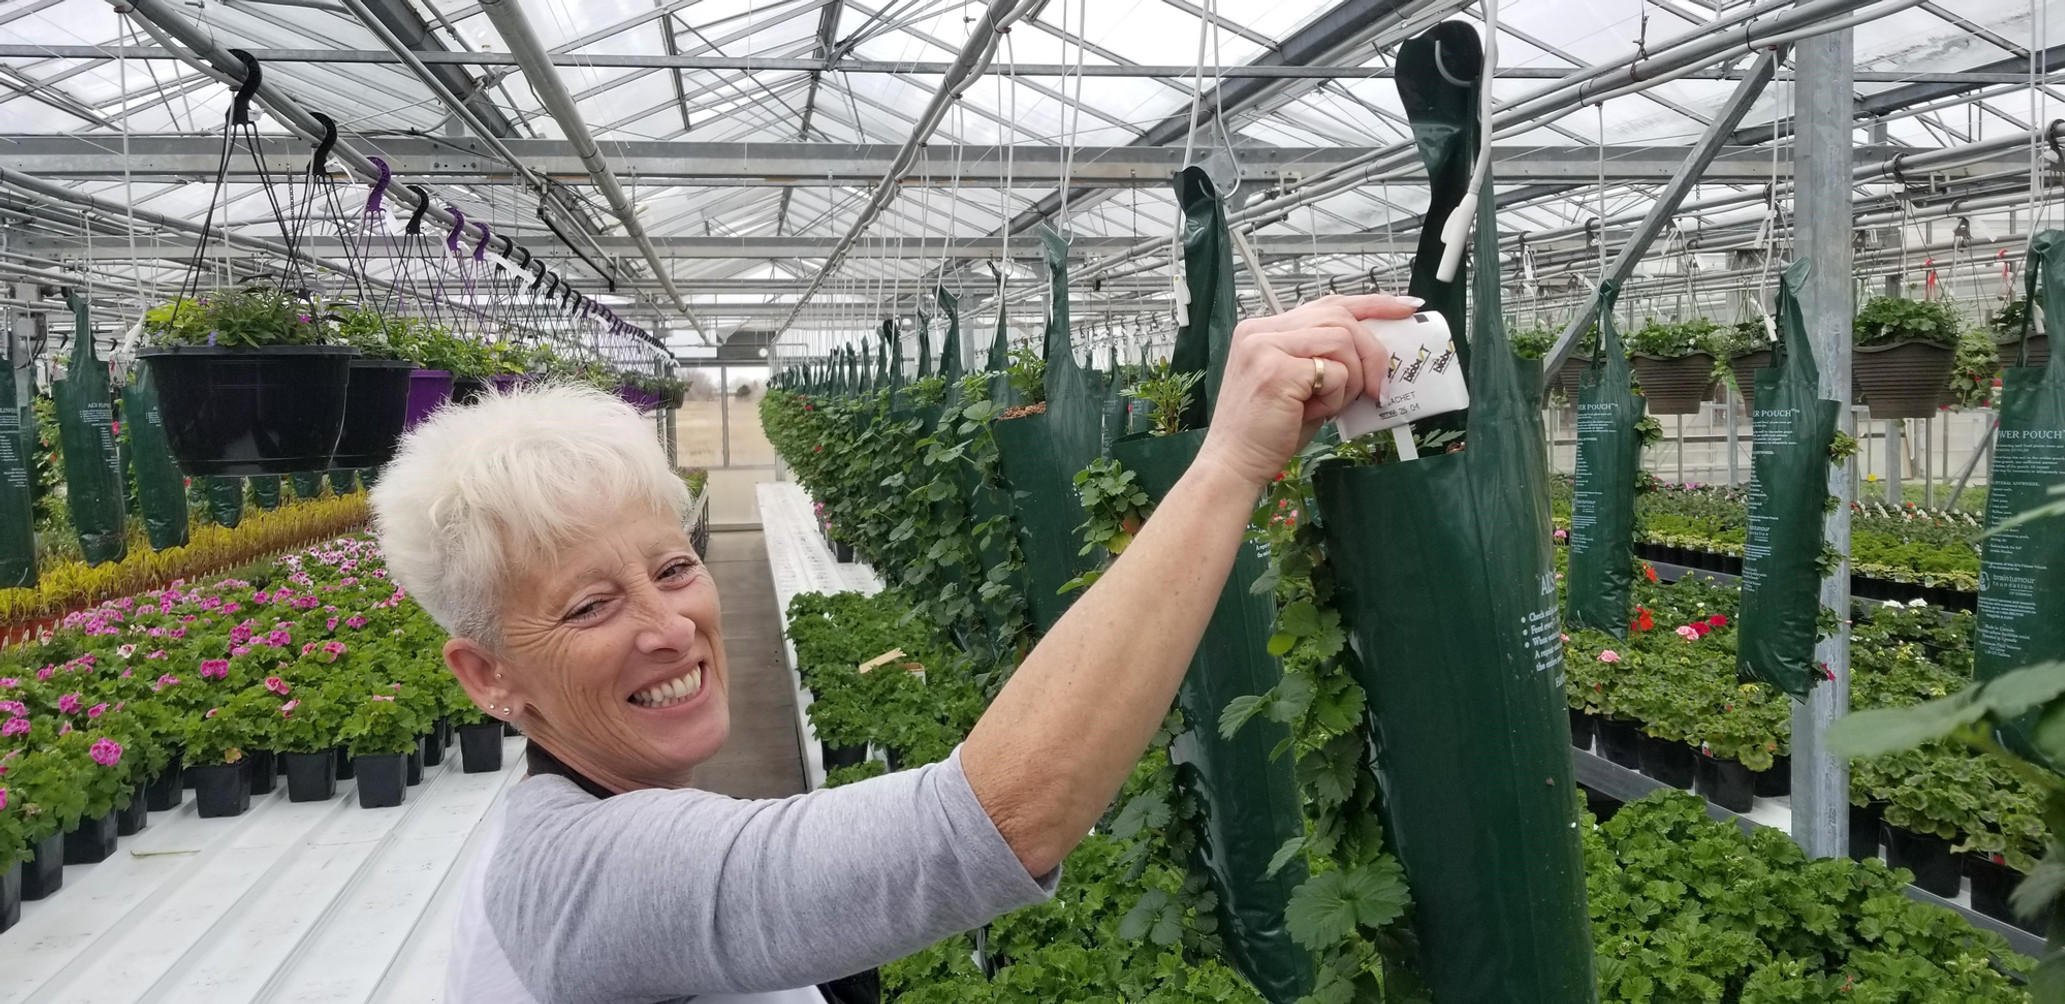 Strawberries make everyone smile @ Thiel's Greenhouses